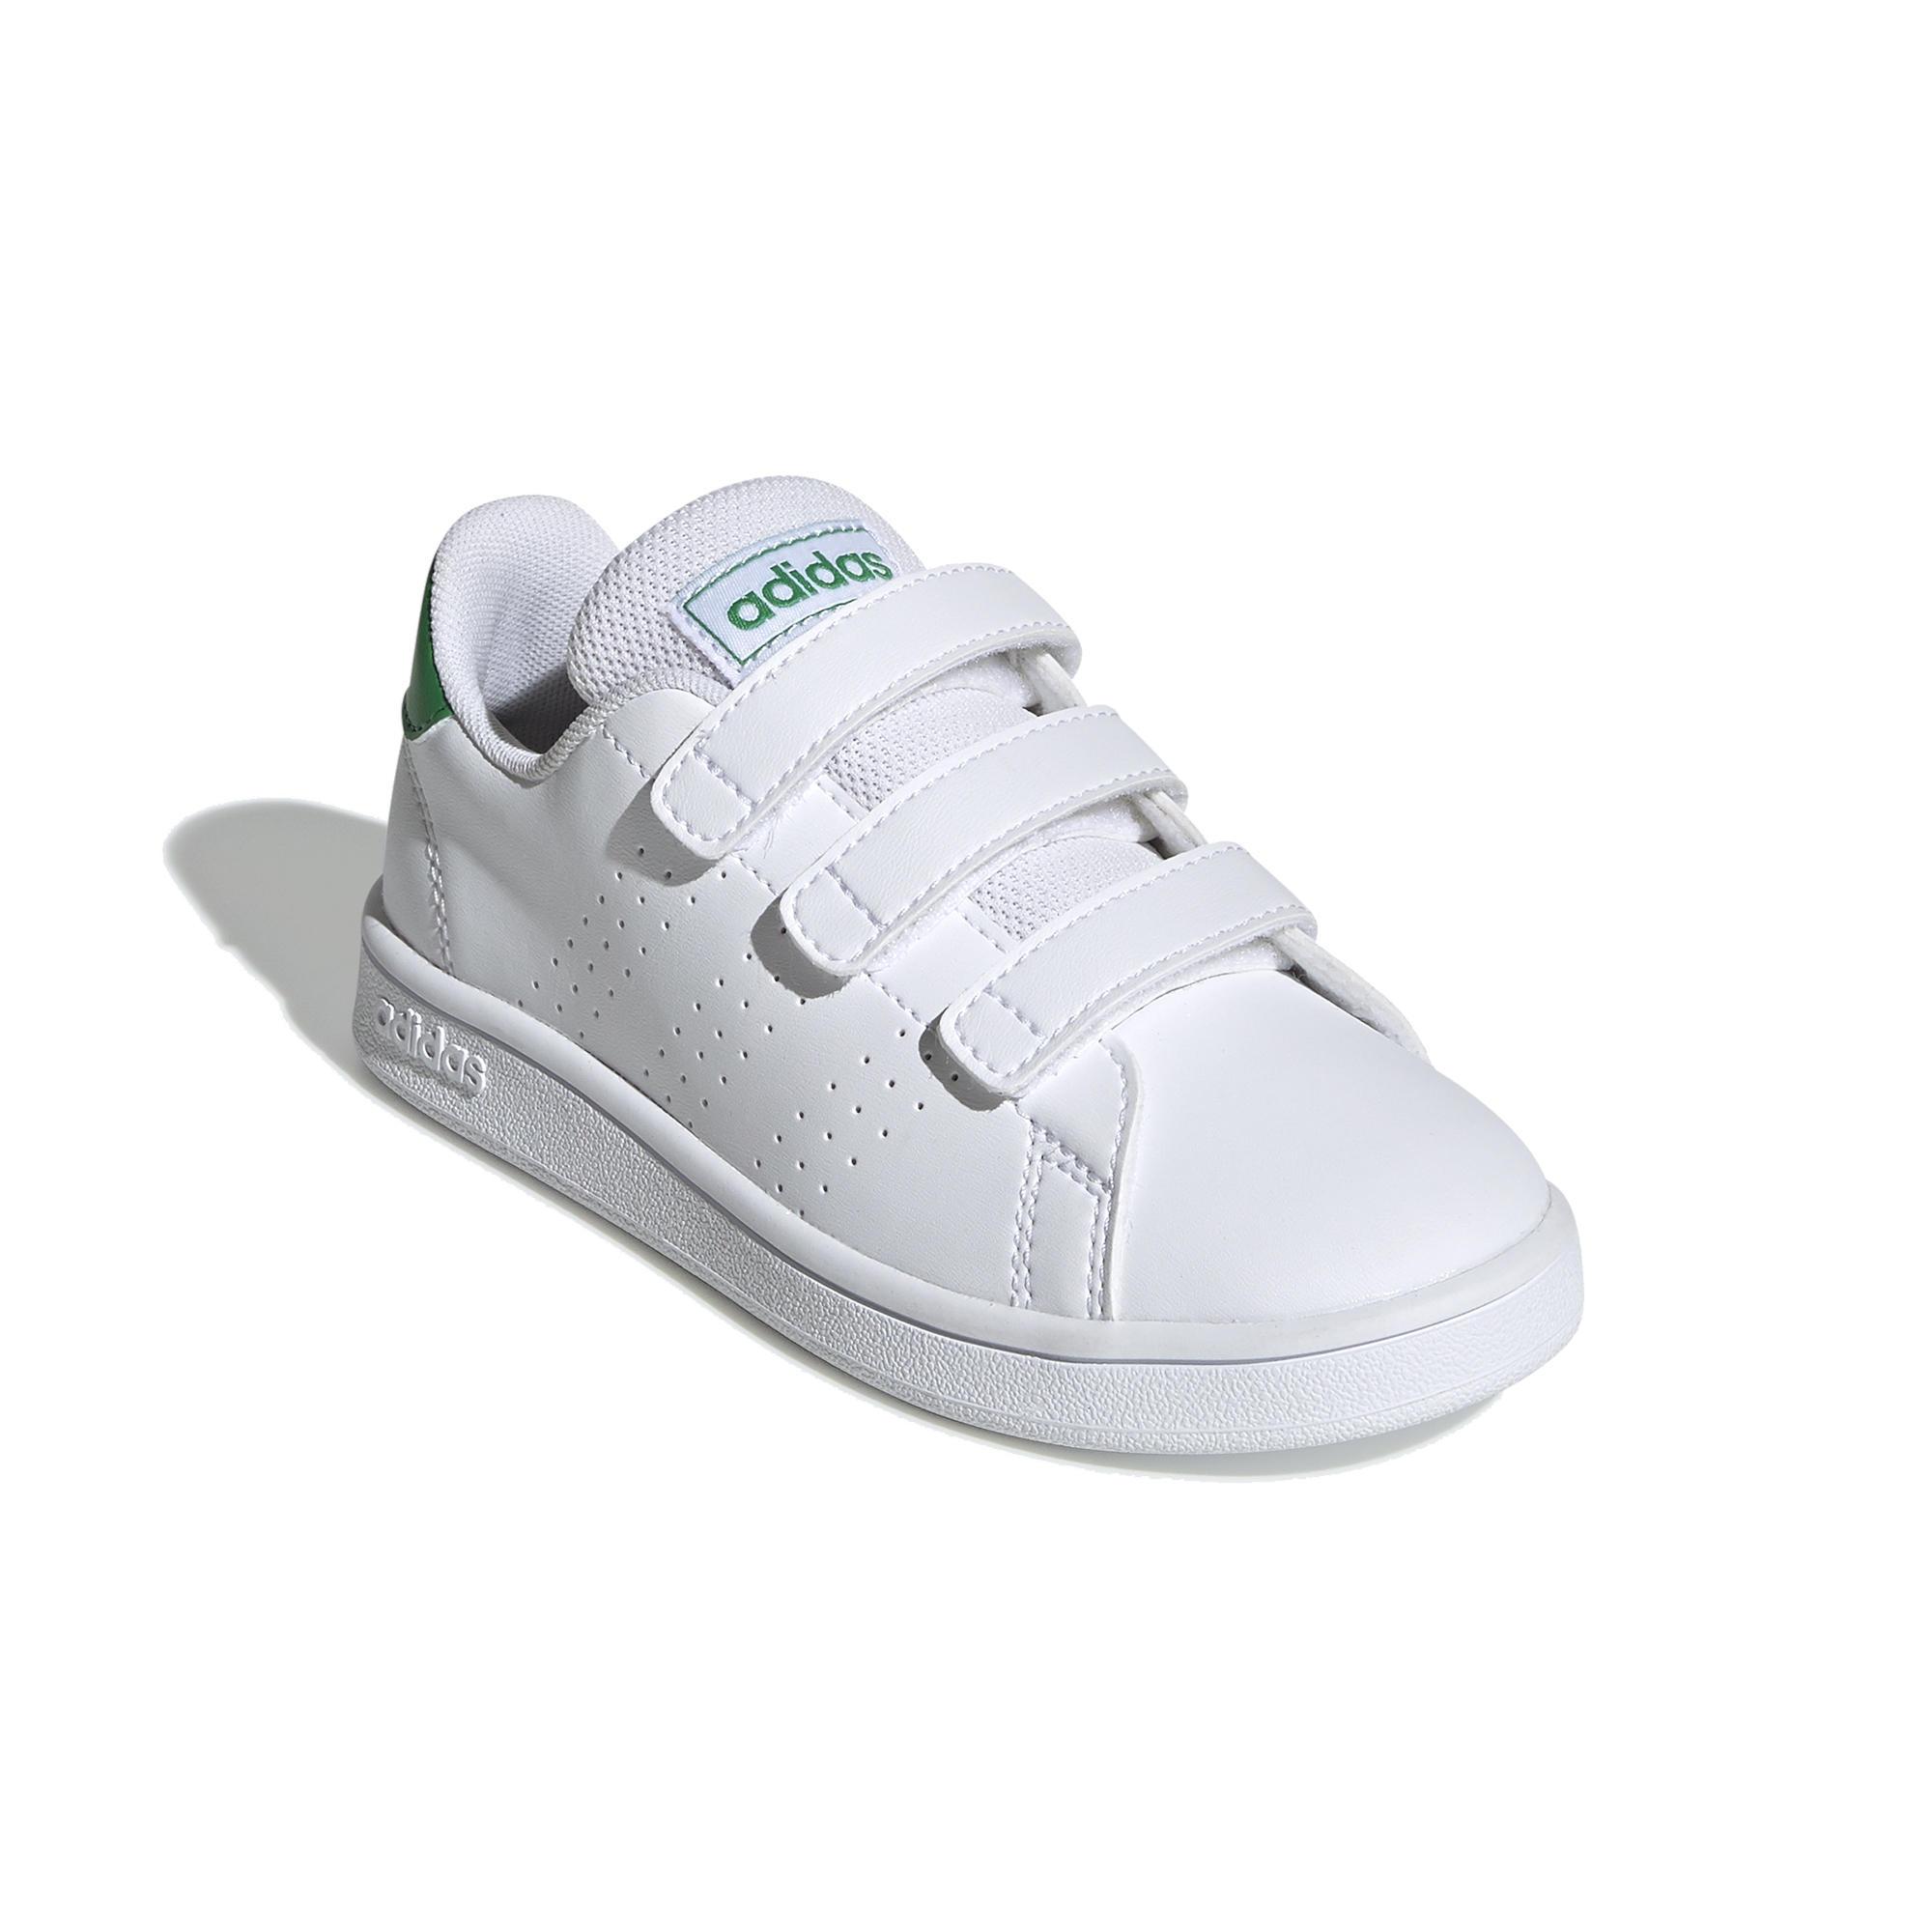 Scarpe tennis bambino adidas ADVANTAGE CLEAN bianco-verde